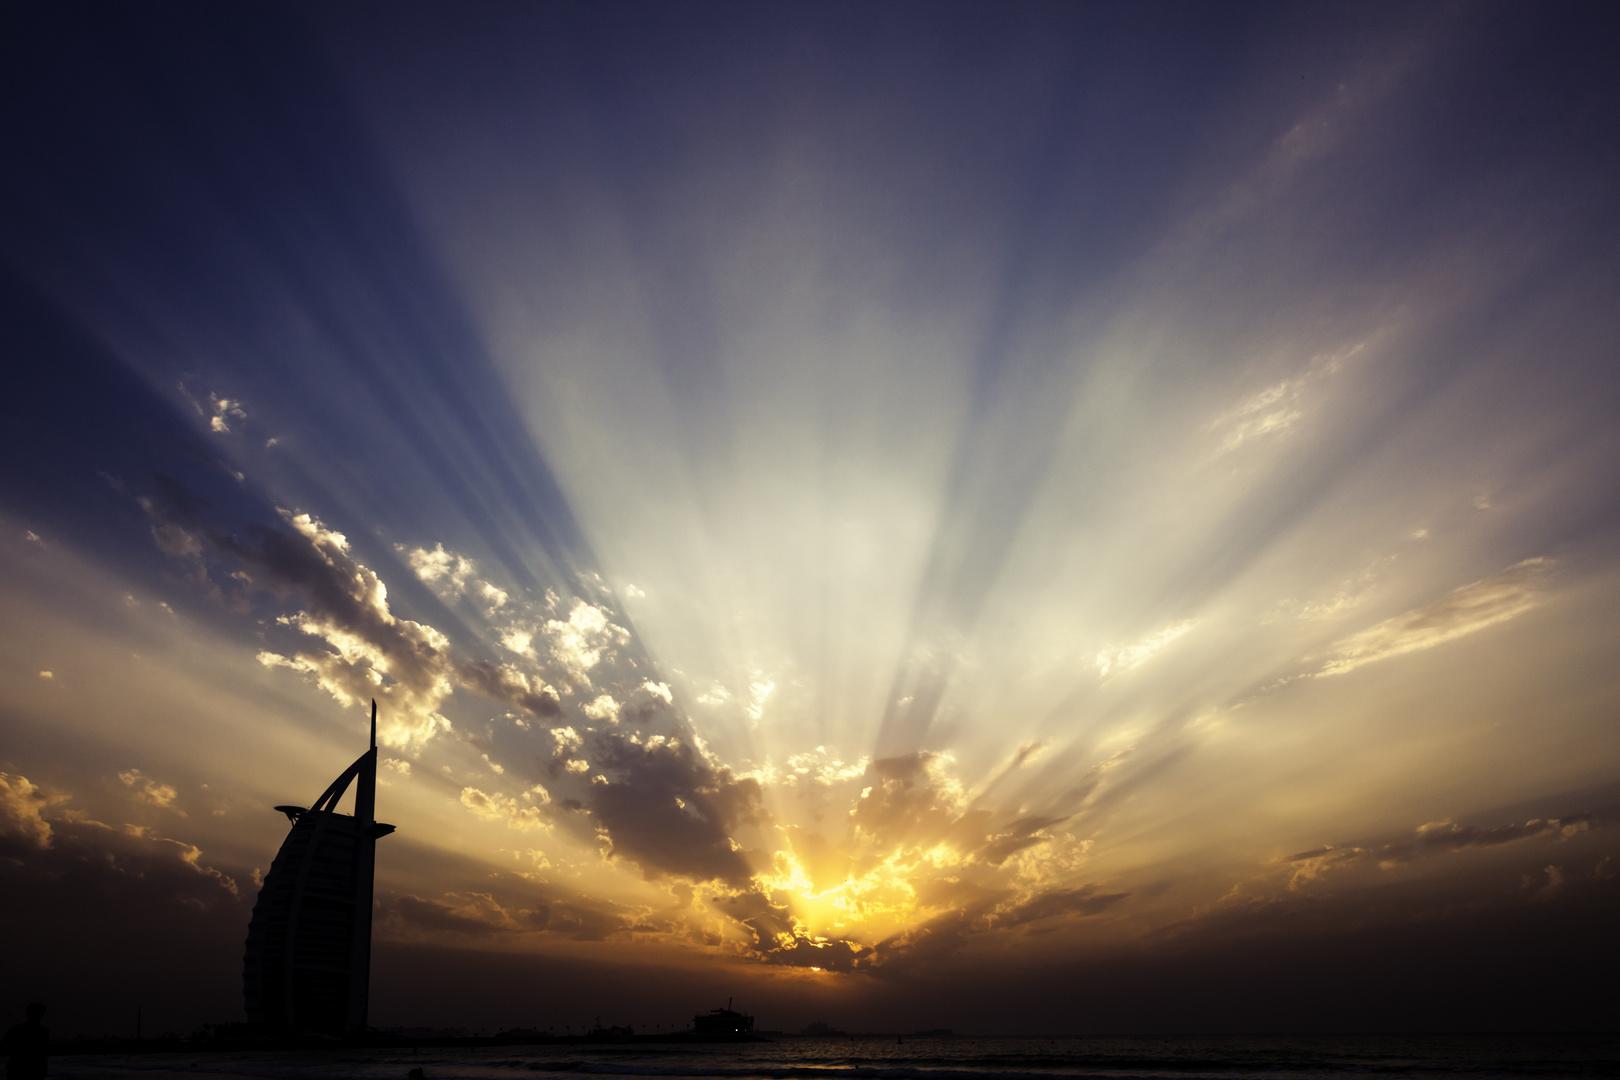 Sunset Burj al Arab